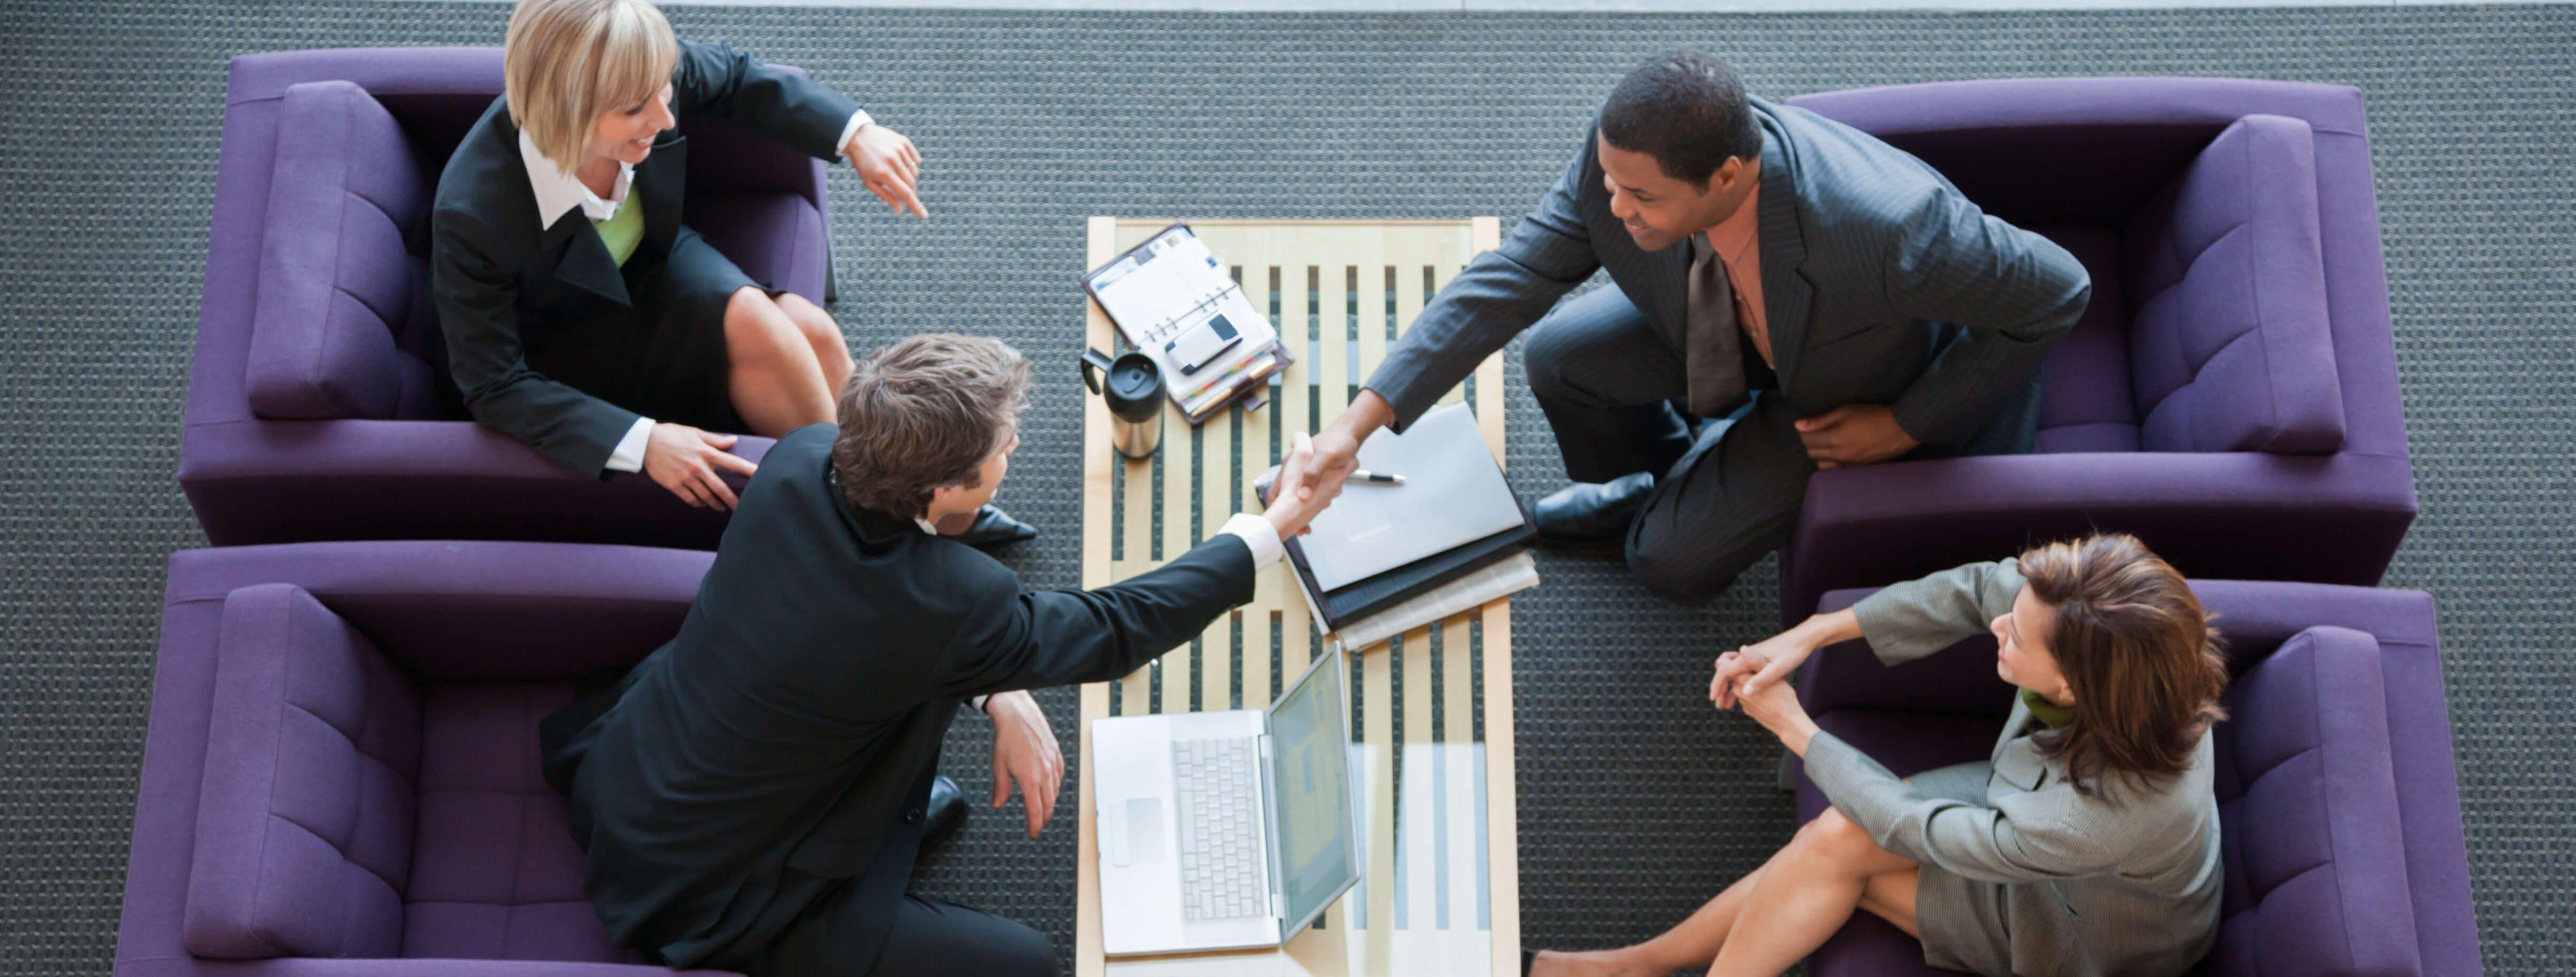 Titelbild-Business-Verhandlung-Abschluss-Handschlag-Handshake-iStock-519079370-FangXiaNuo